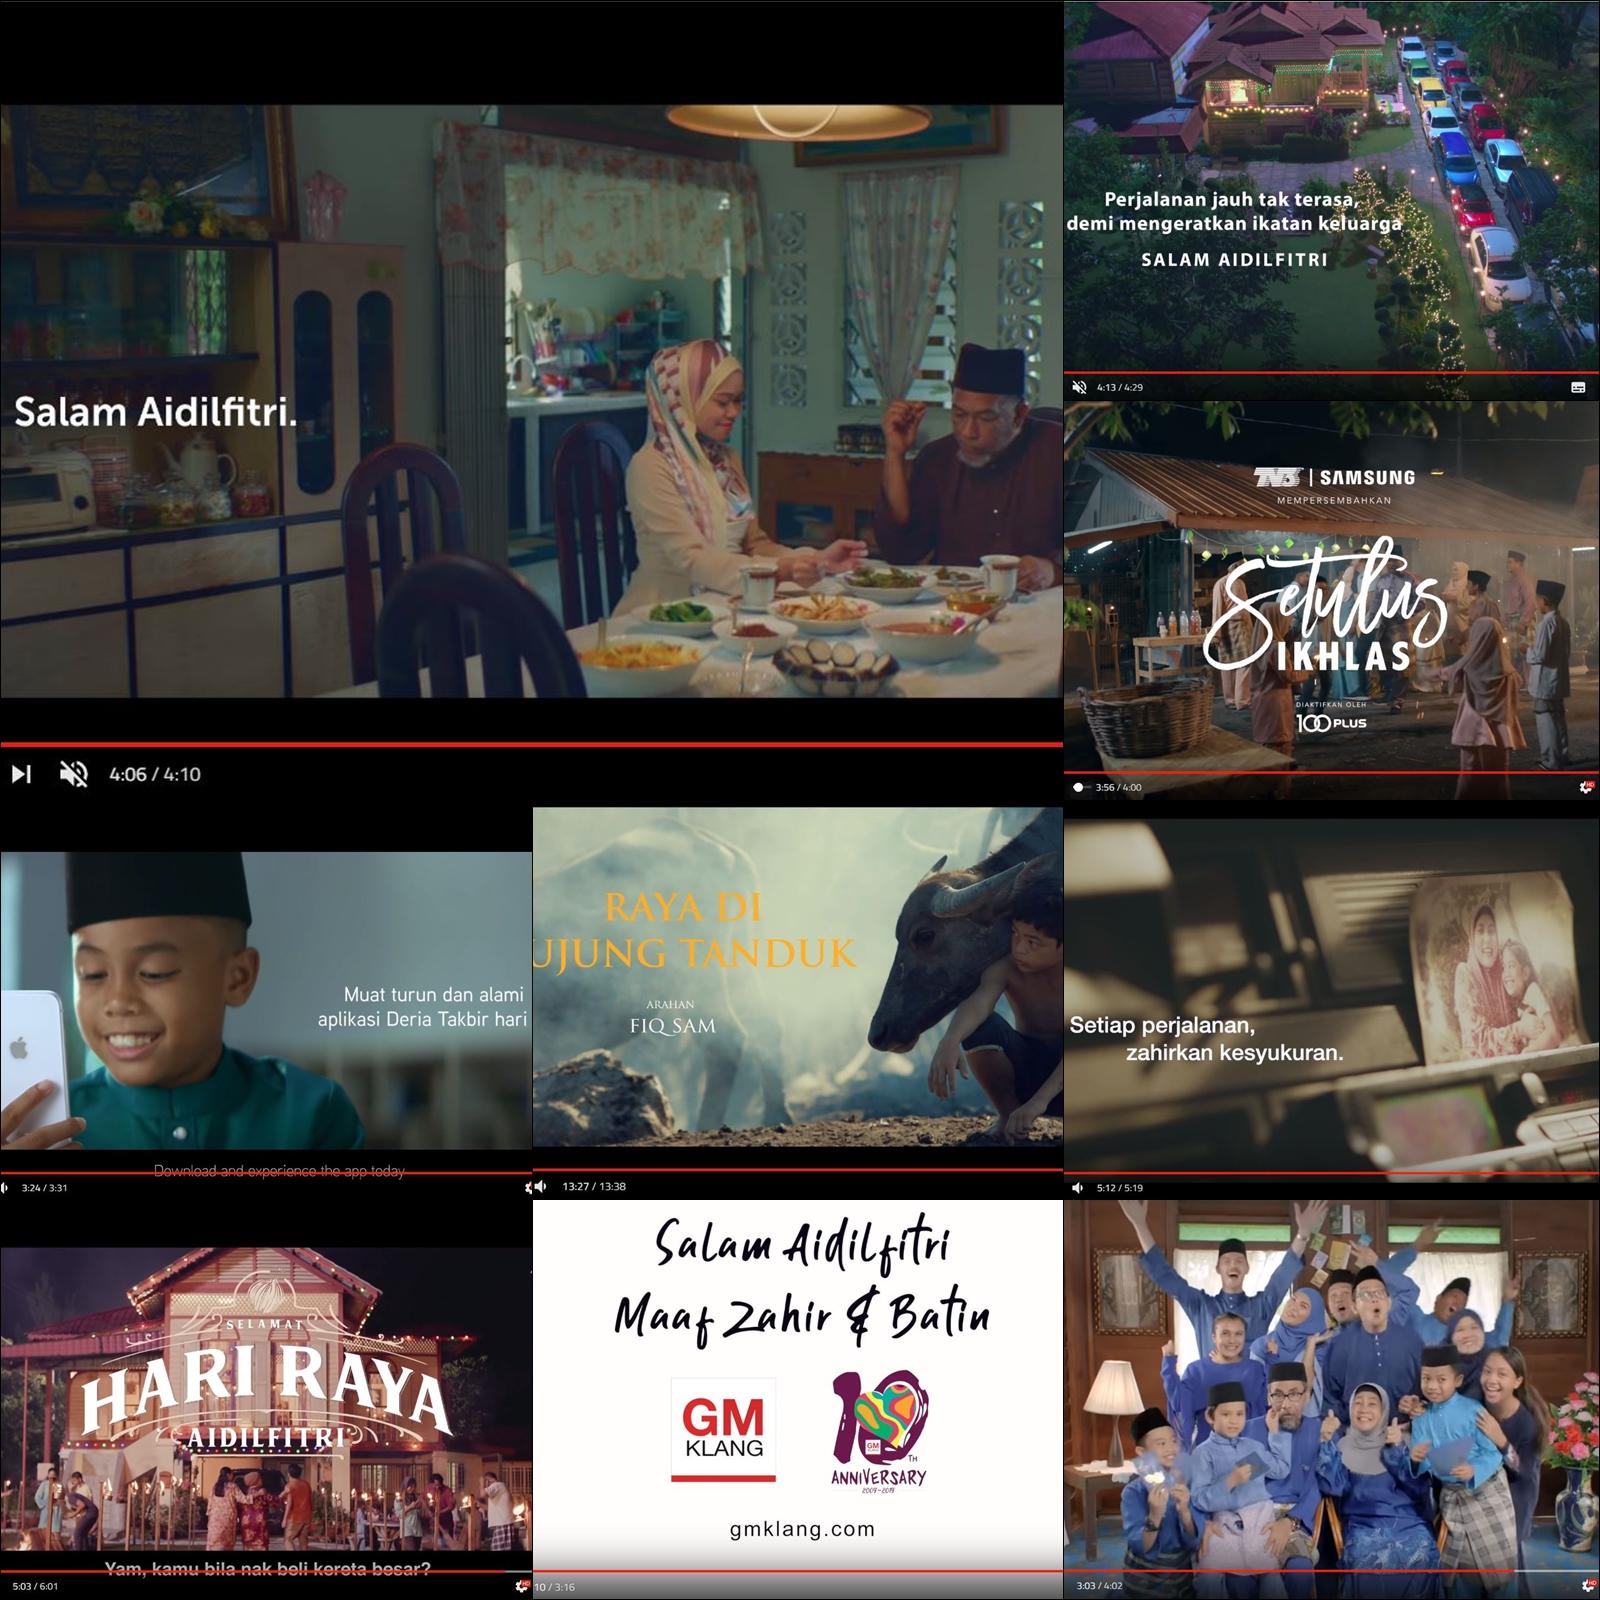 Video Raya 2019, Iklan raya 2019, Yasmin Ahmad, Rawlins GLAM, Selamat Hari Raya 2019